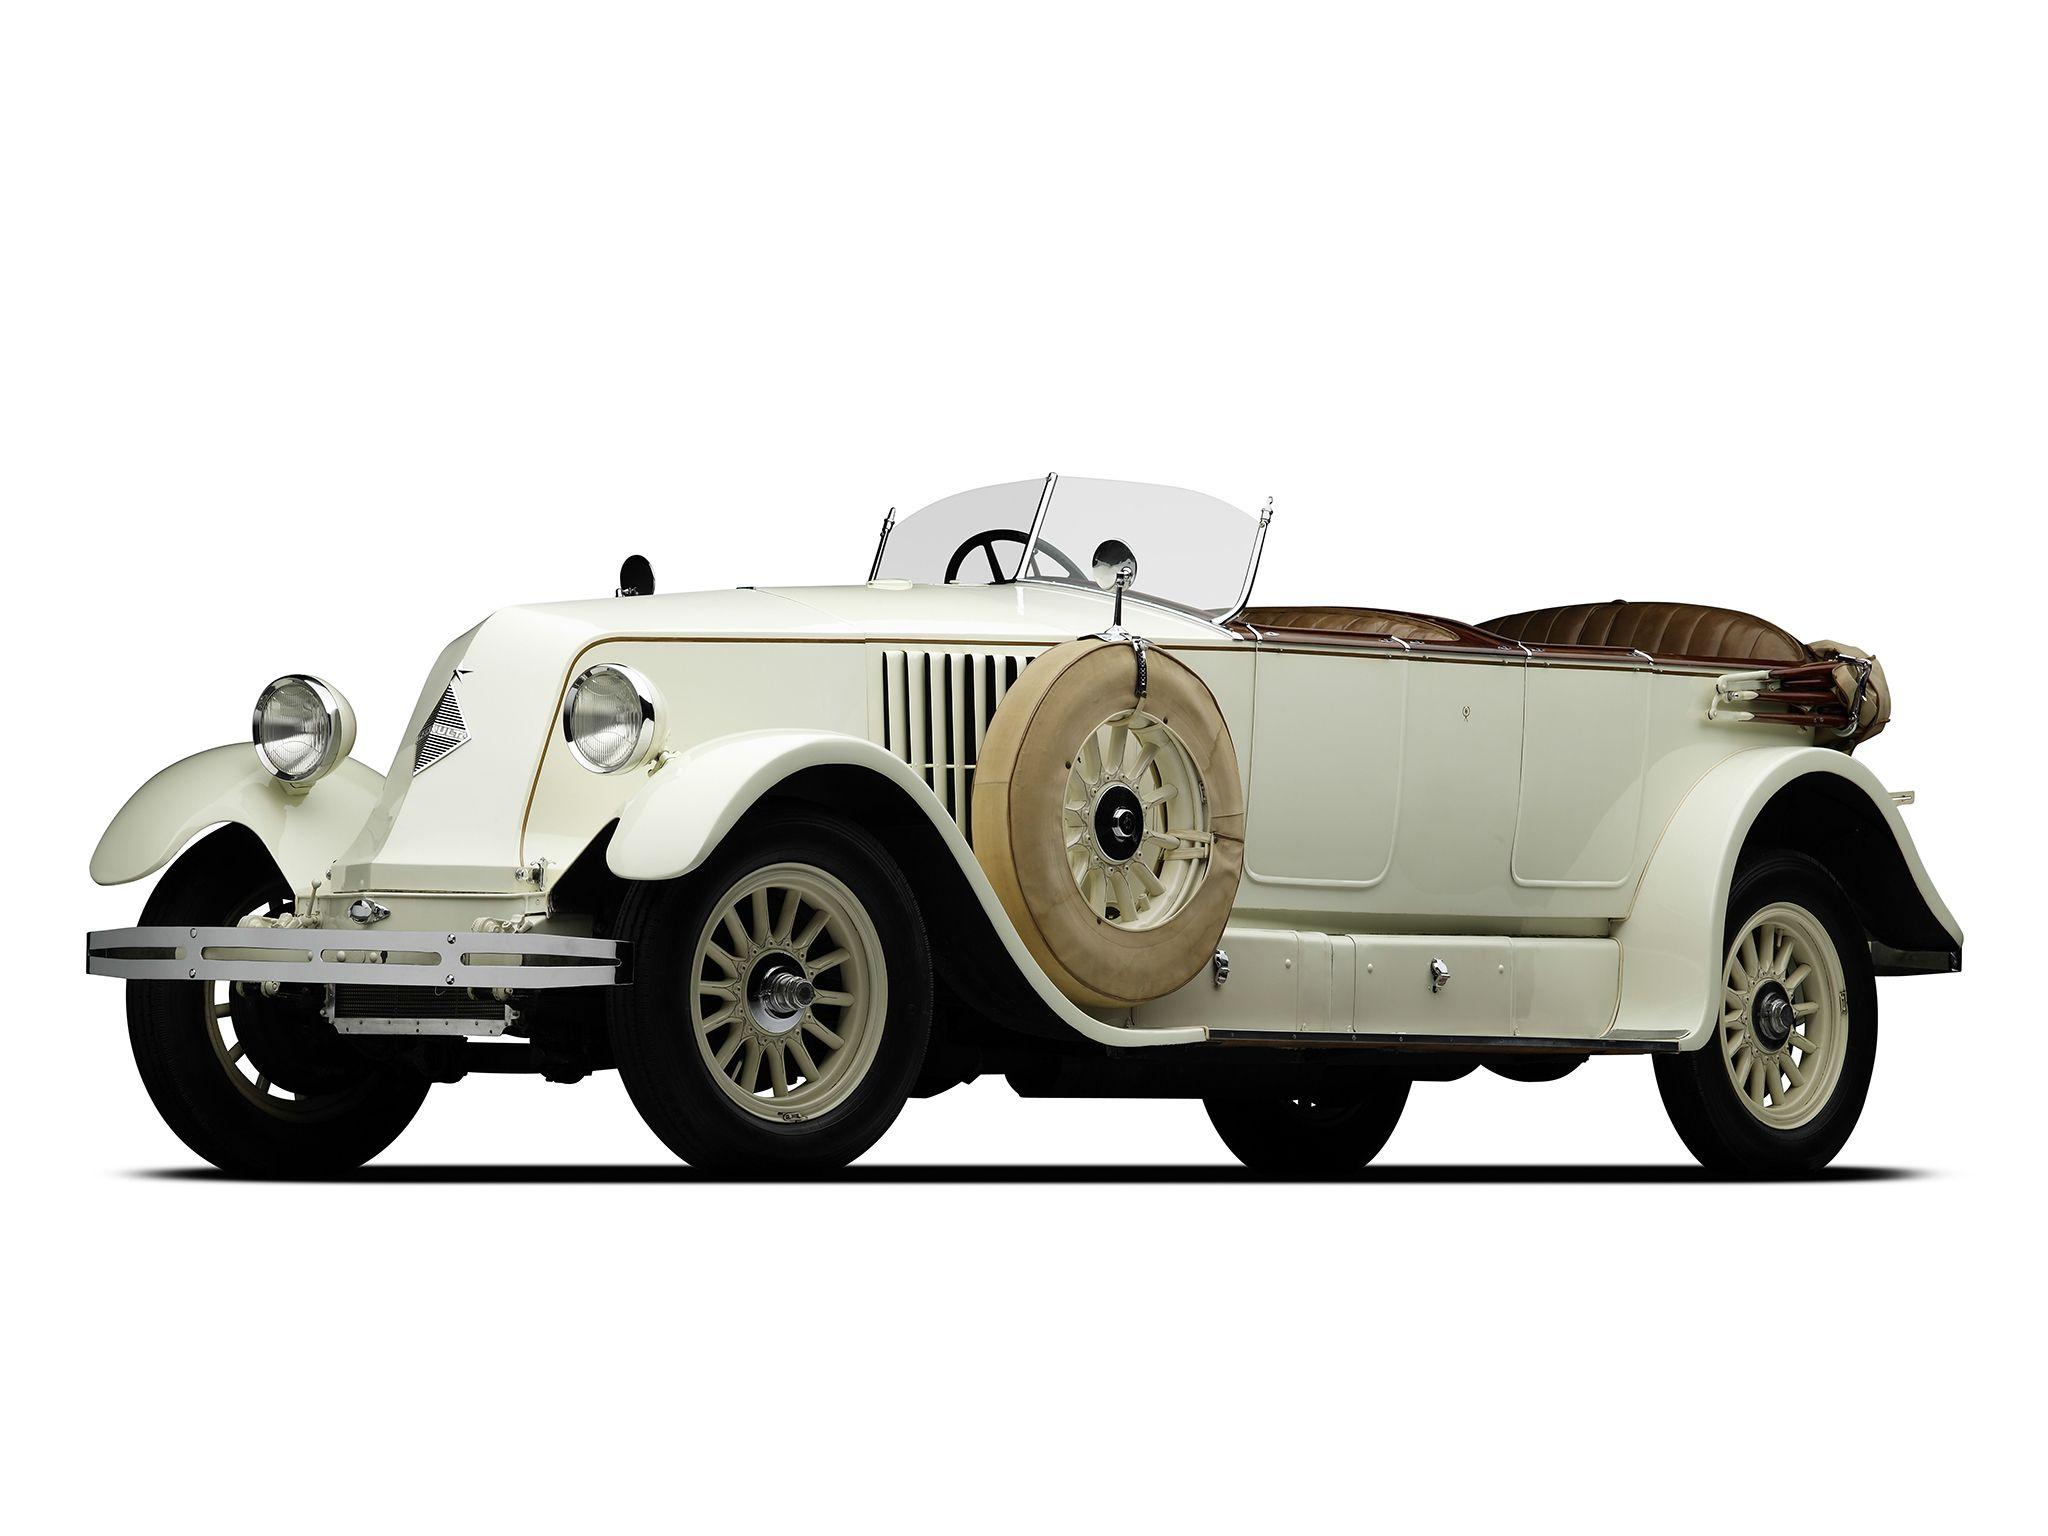 1924 Renault 40 Cv Type Mc Tourer Cars I Love Antique Cars